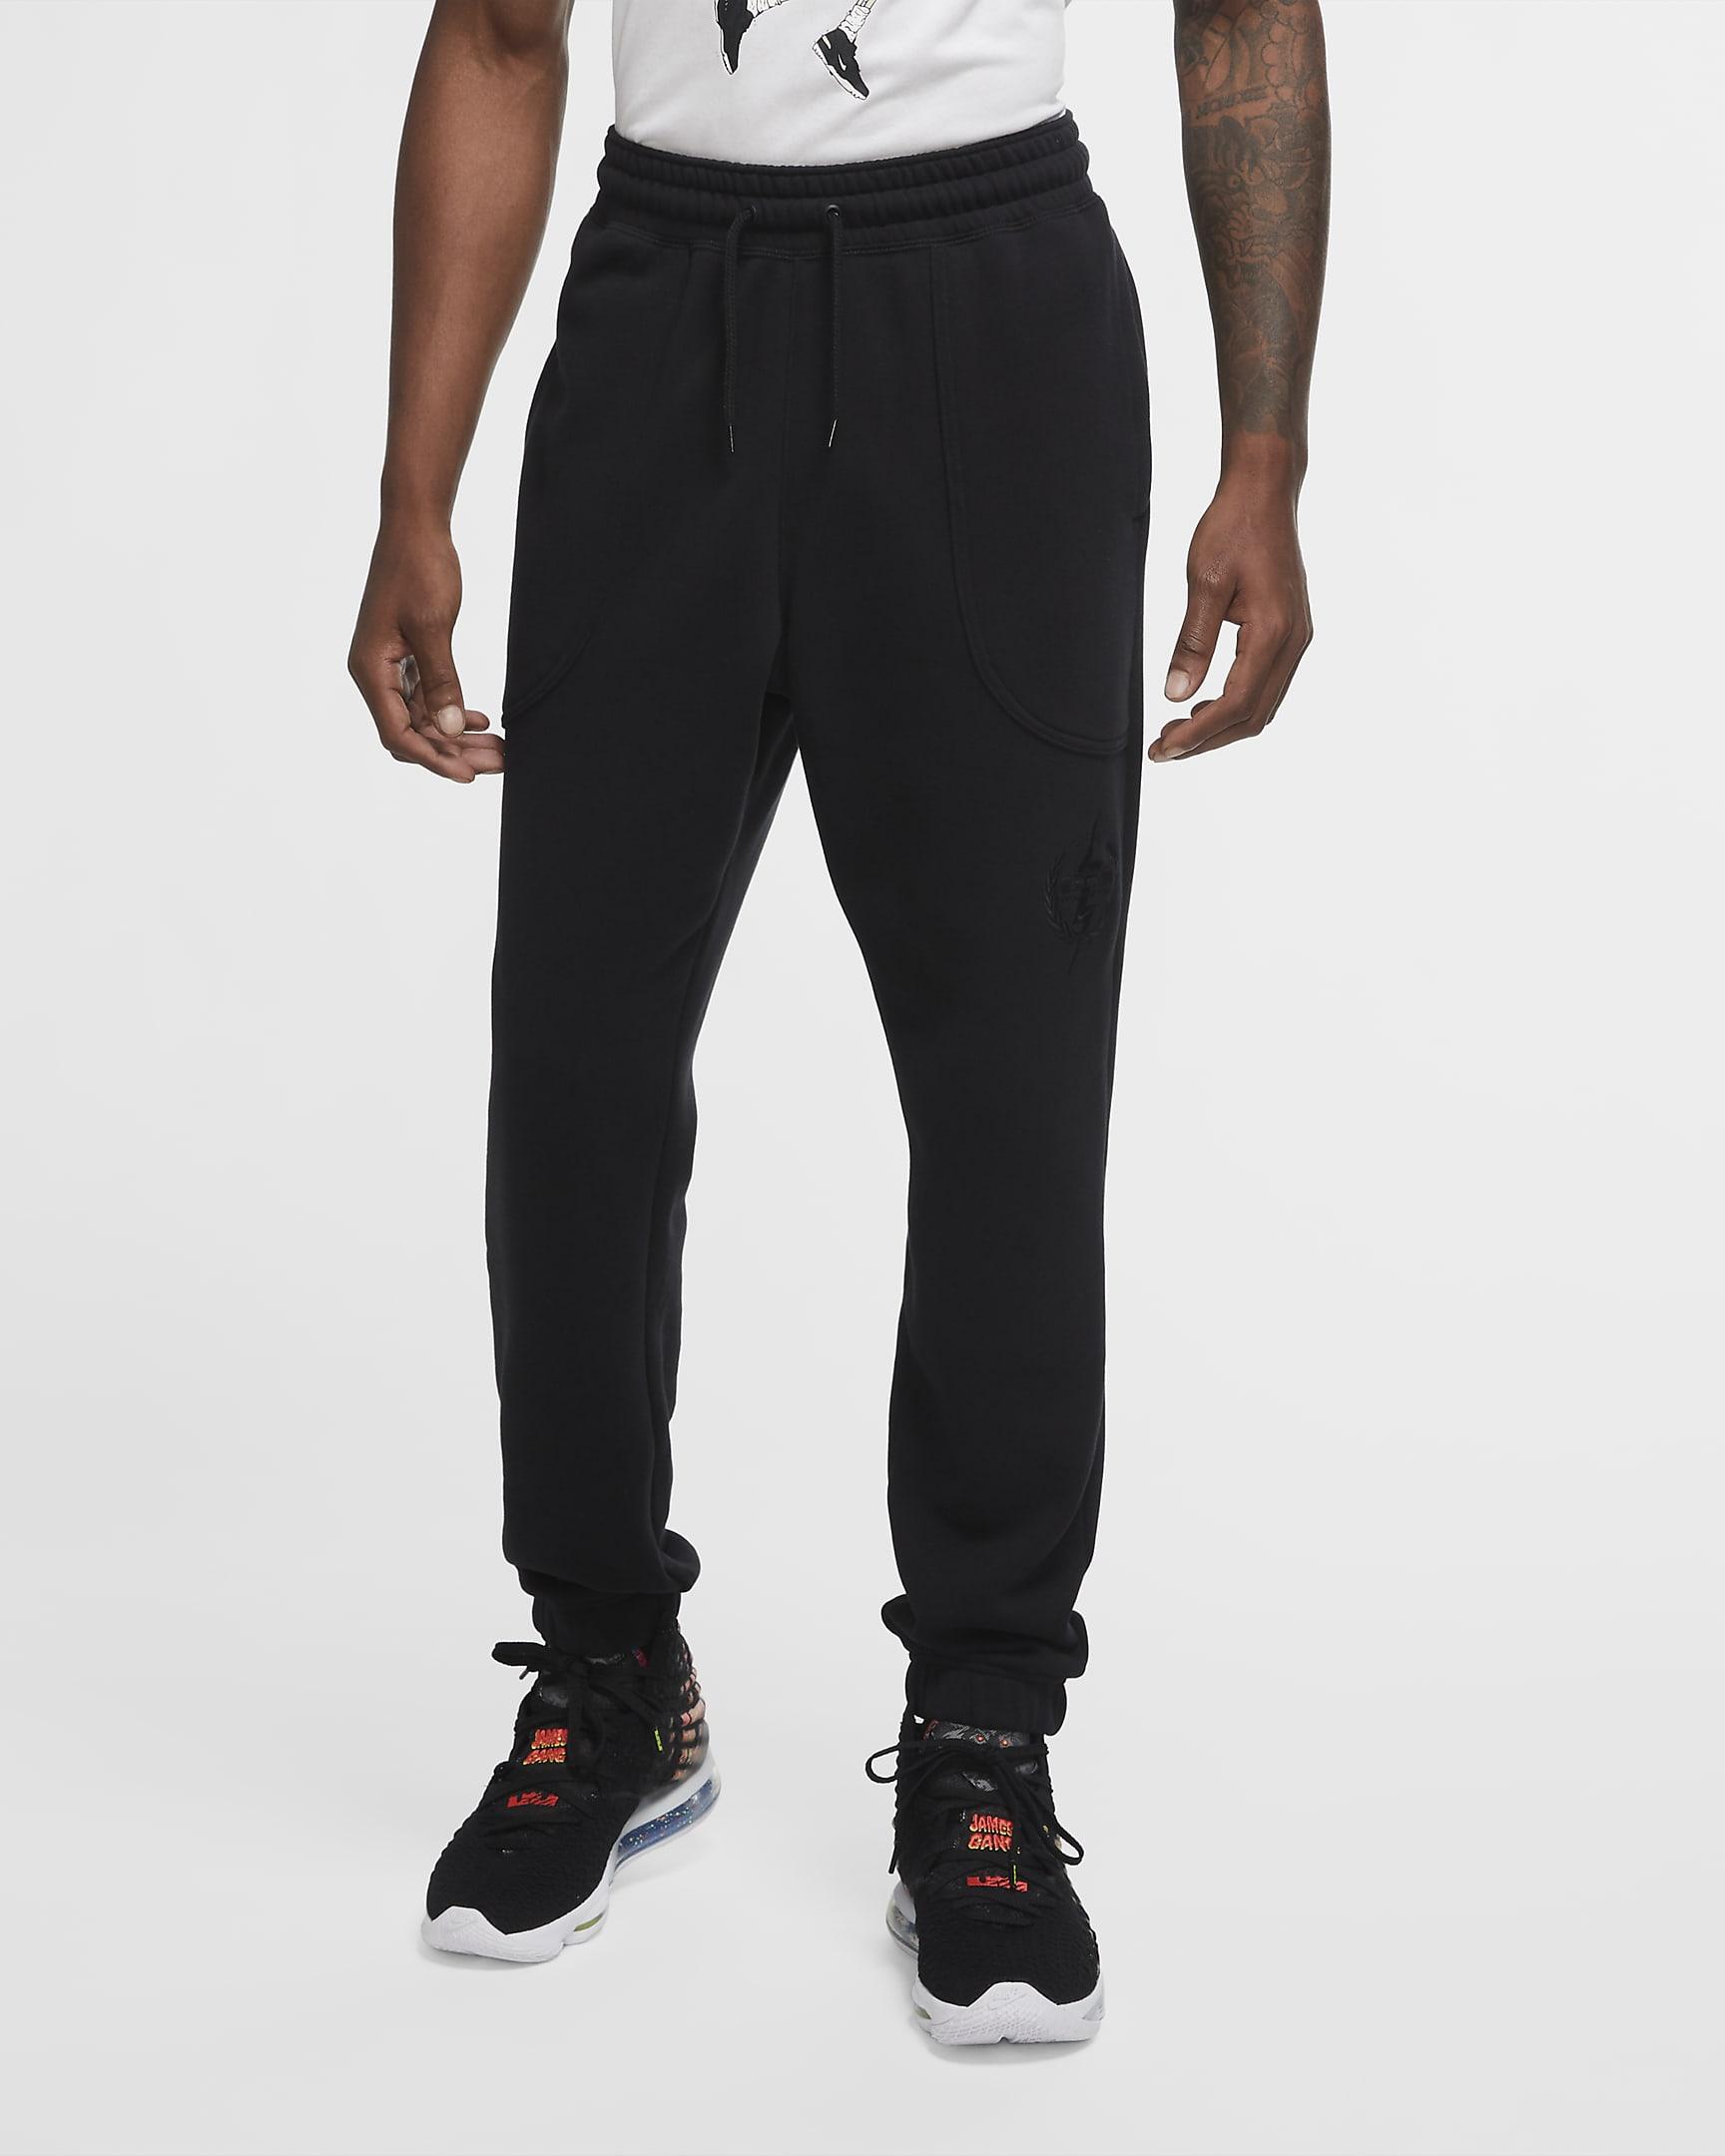 lebron-mens-basketball-pants-G2h2Gl-1